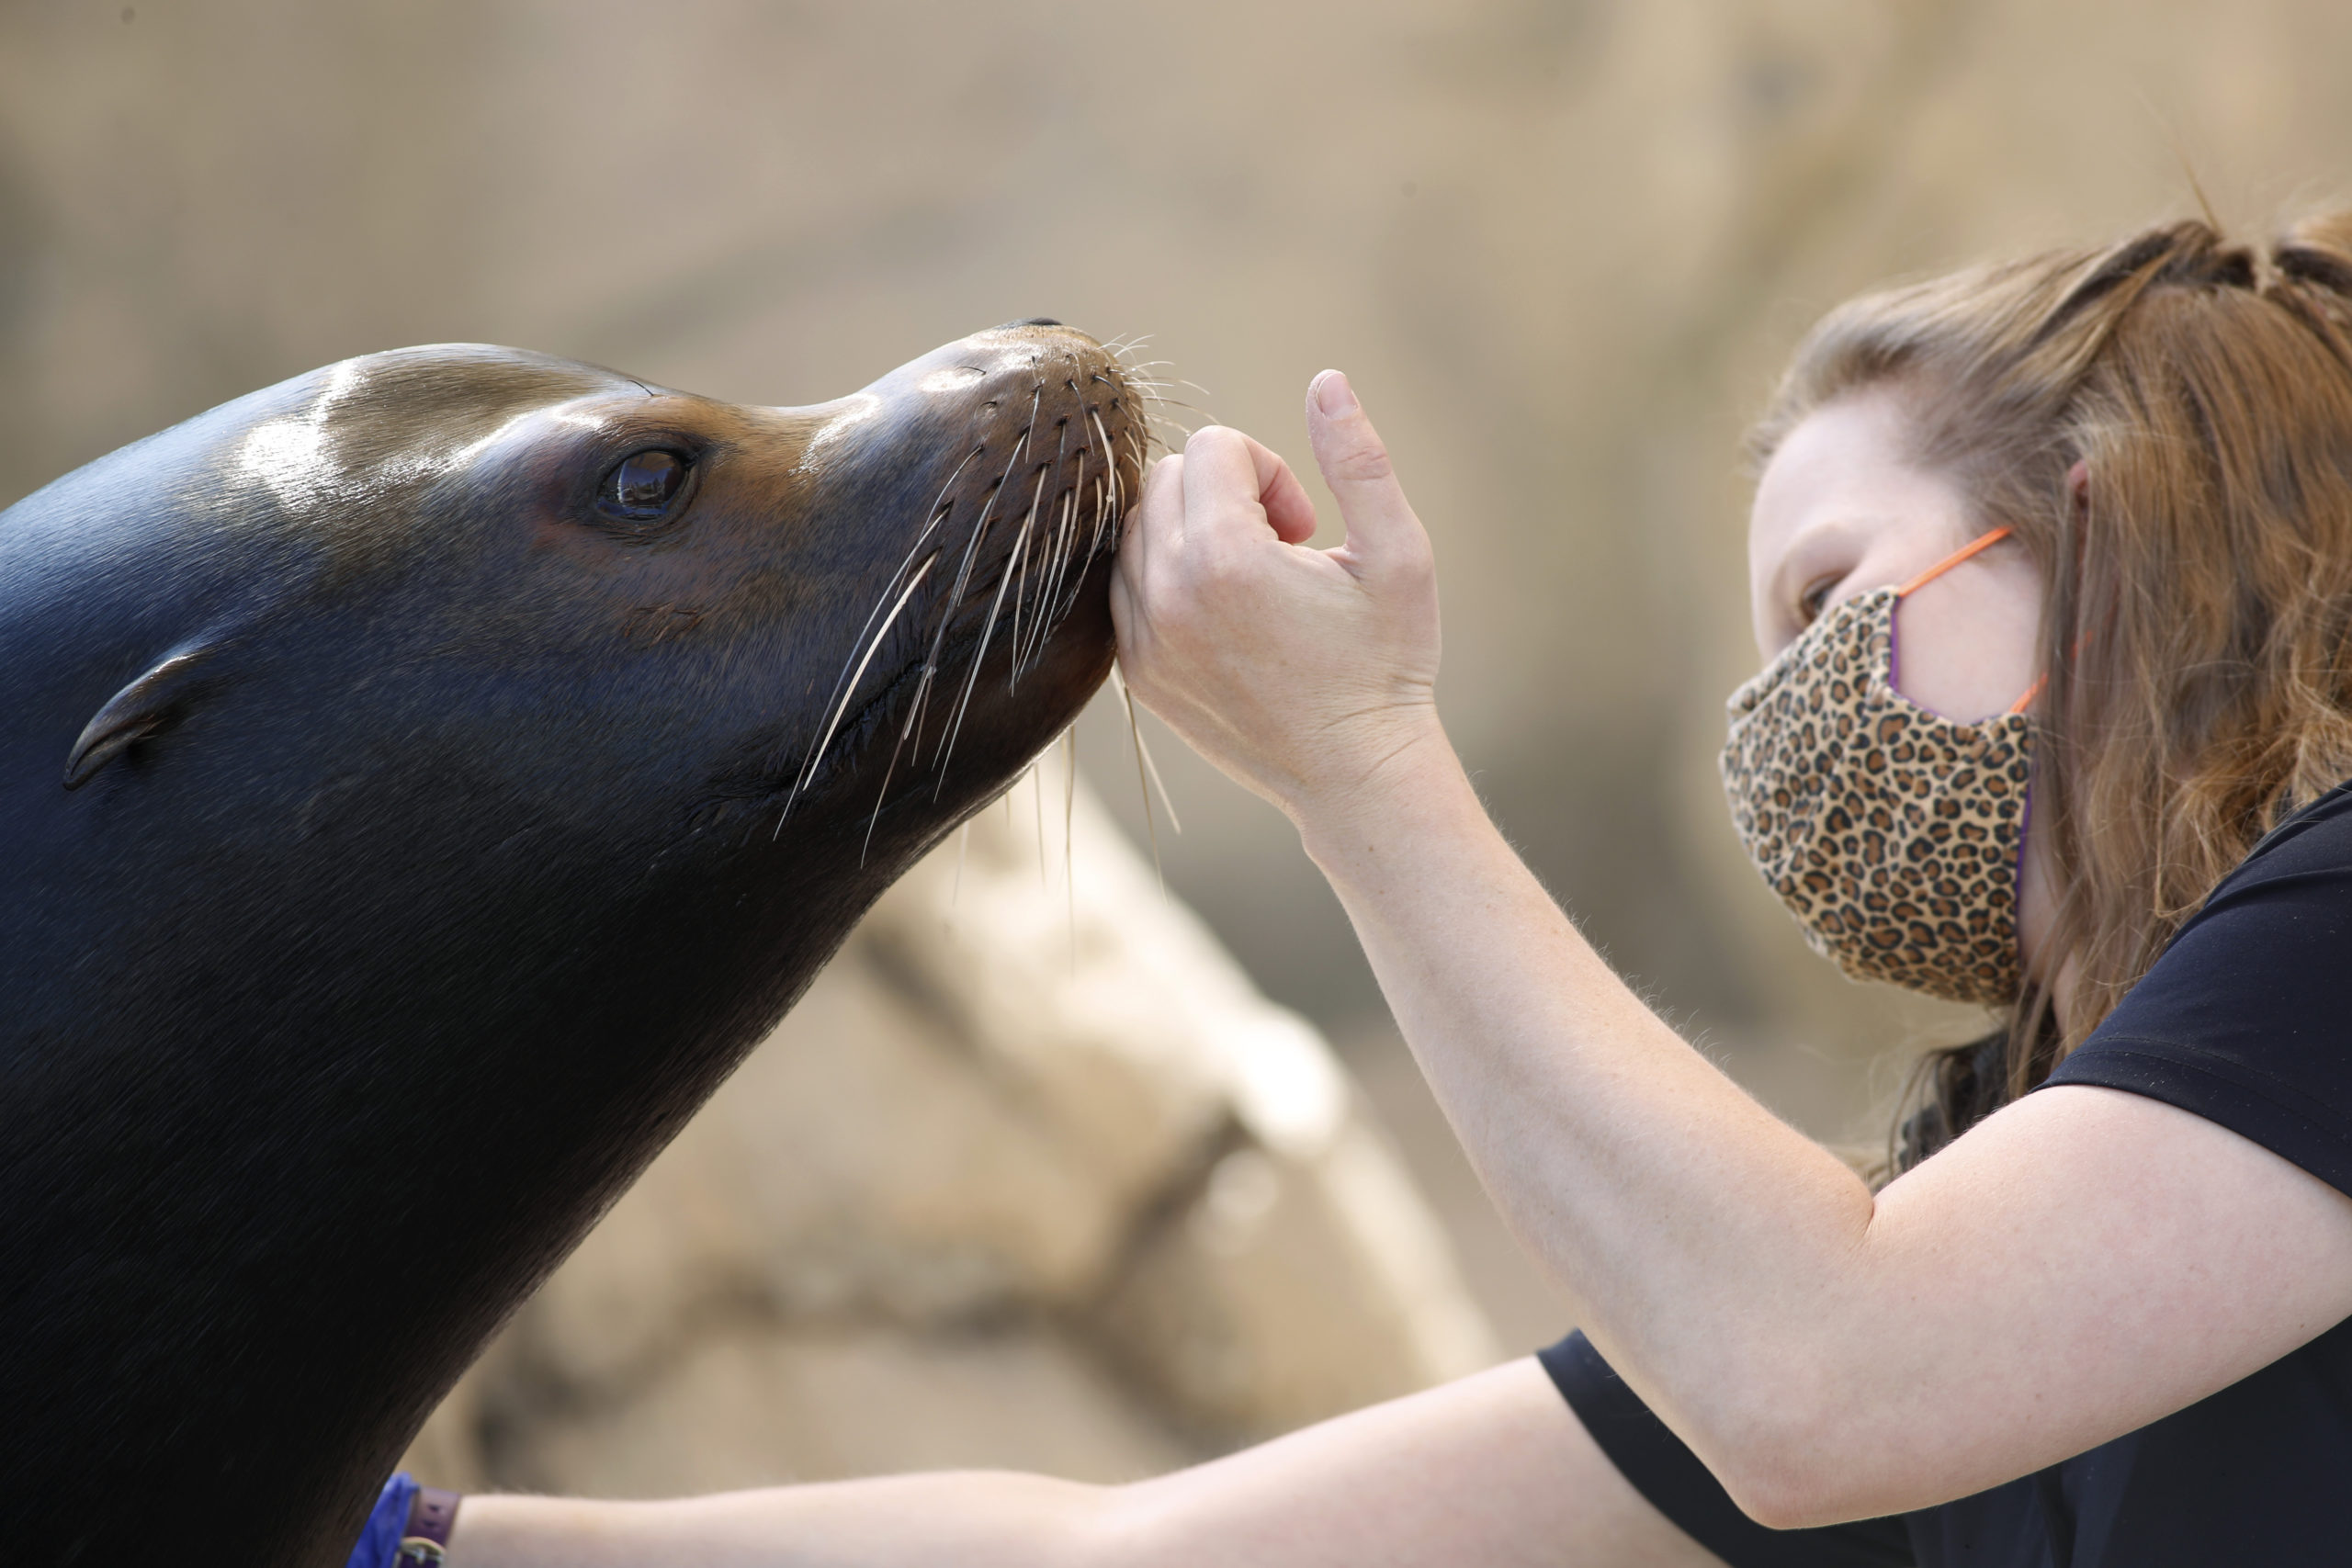 denver zoo, nick the sea lion, brandi taylor, r m